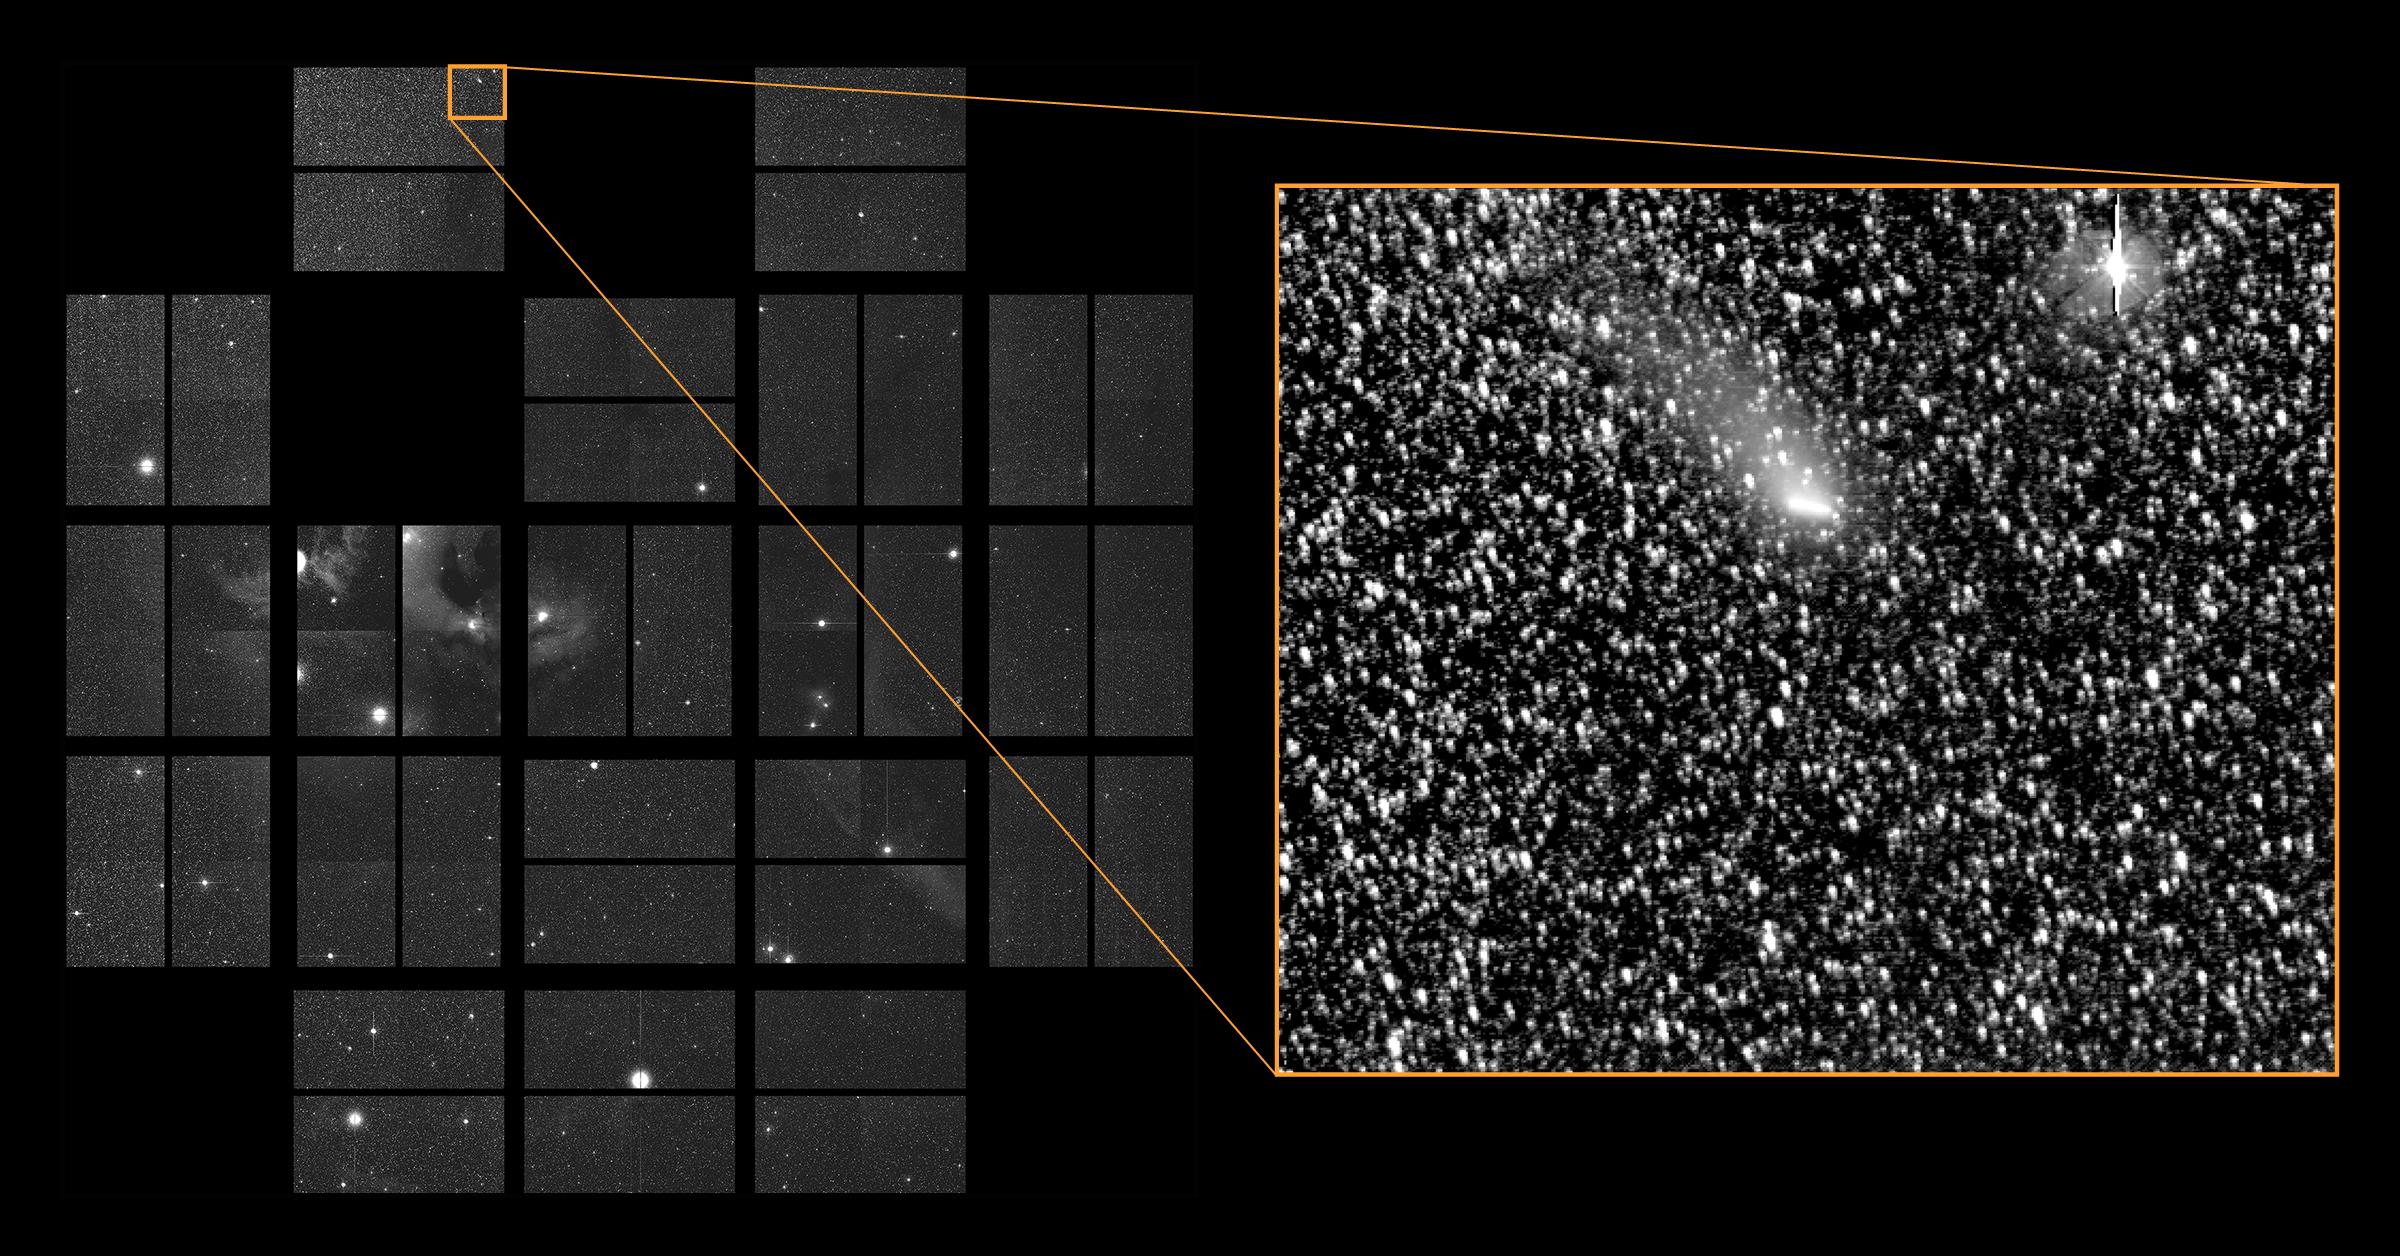 Comet Siding Spring Passes Through K2 S Field Of View Nasa